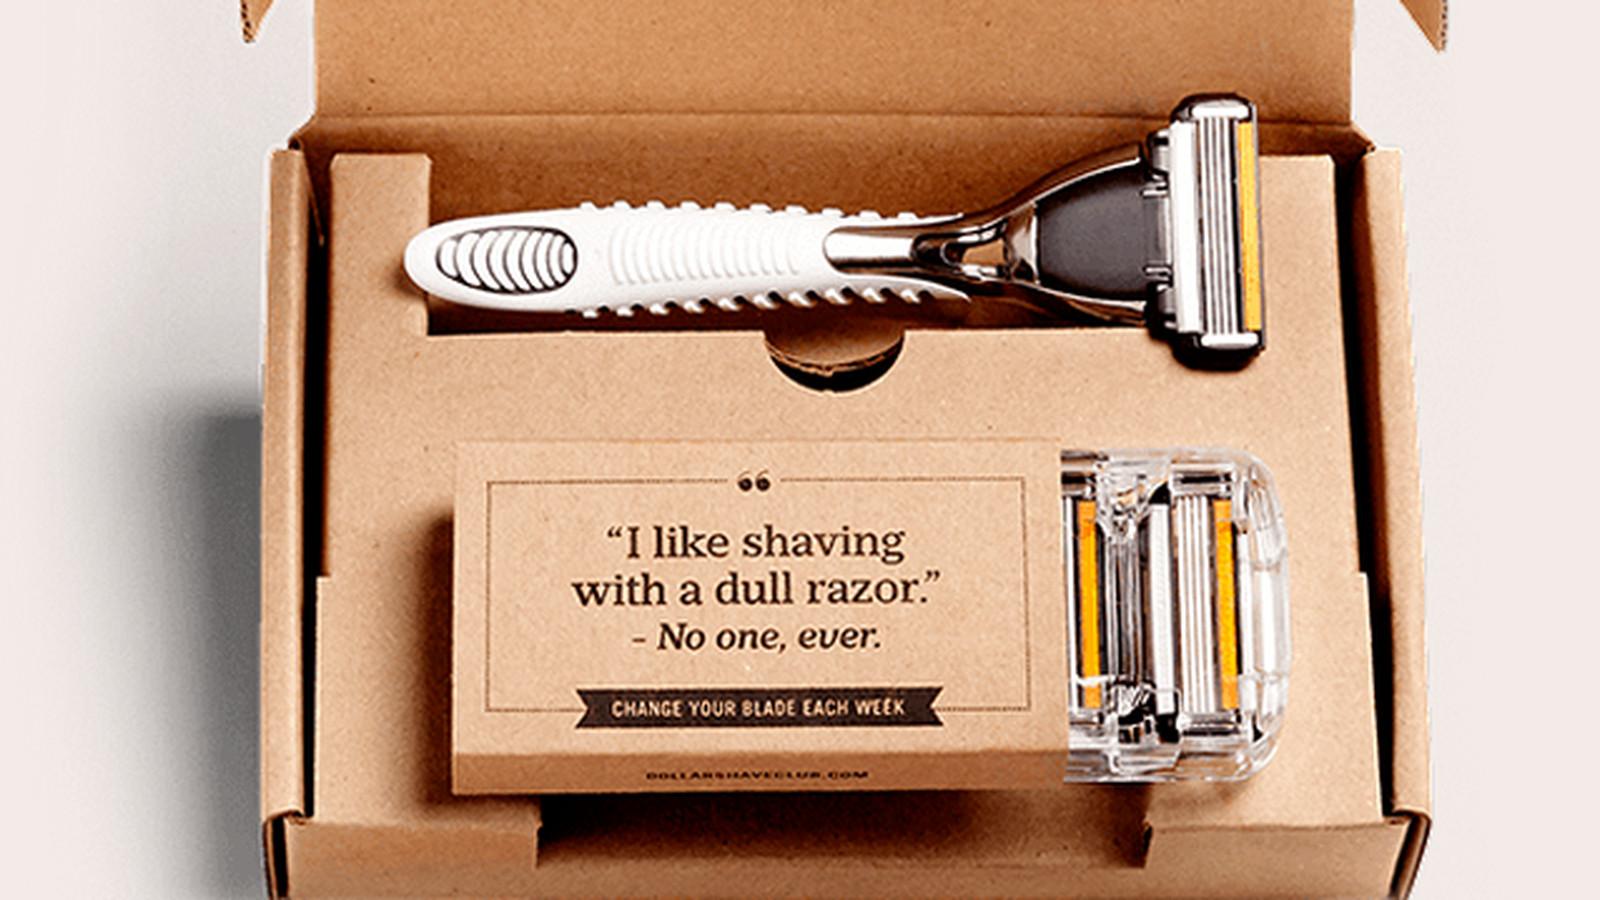 Dollar shave club raises 75 million recode for Bathroom 75 million